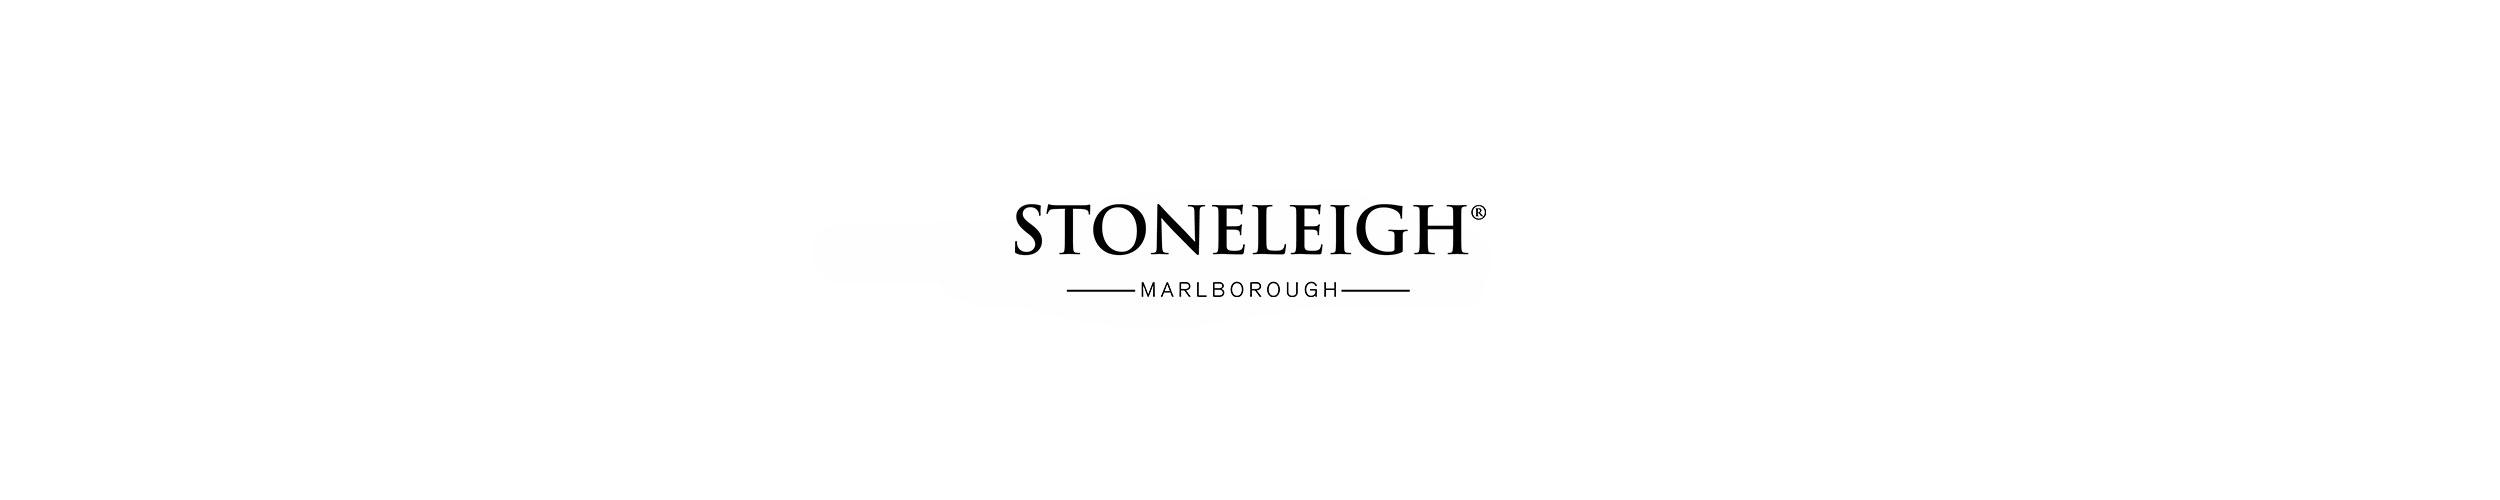 stoneleigh.jpg